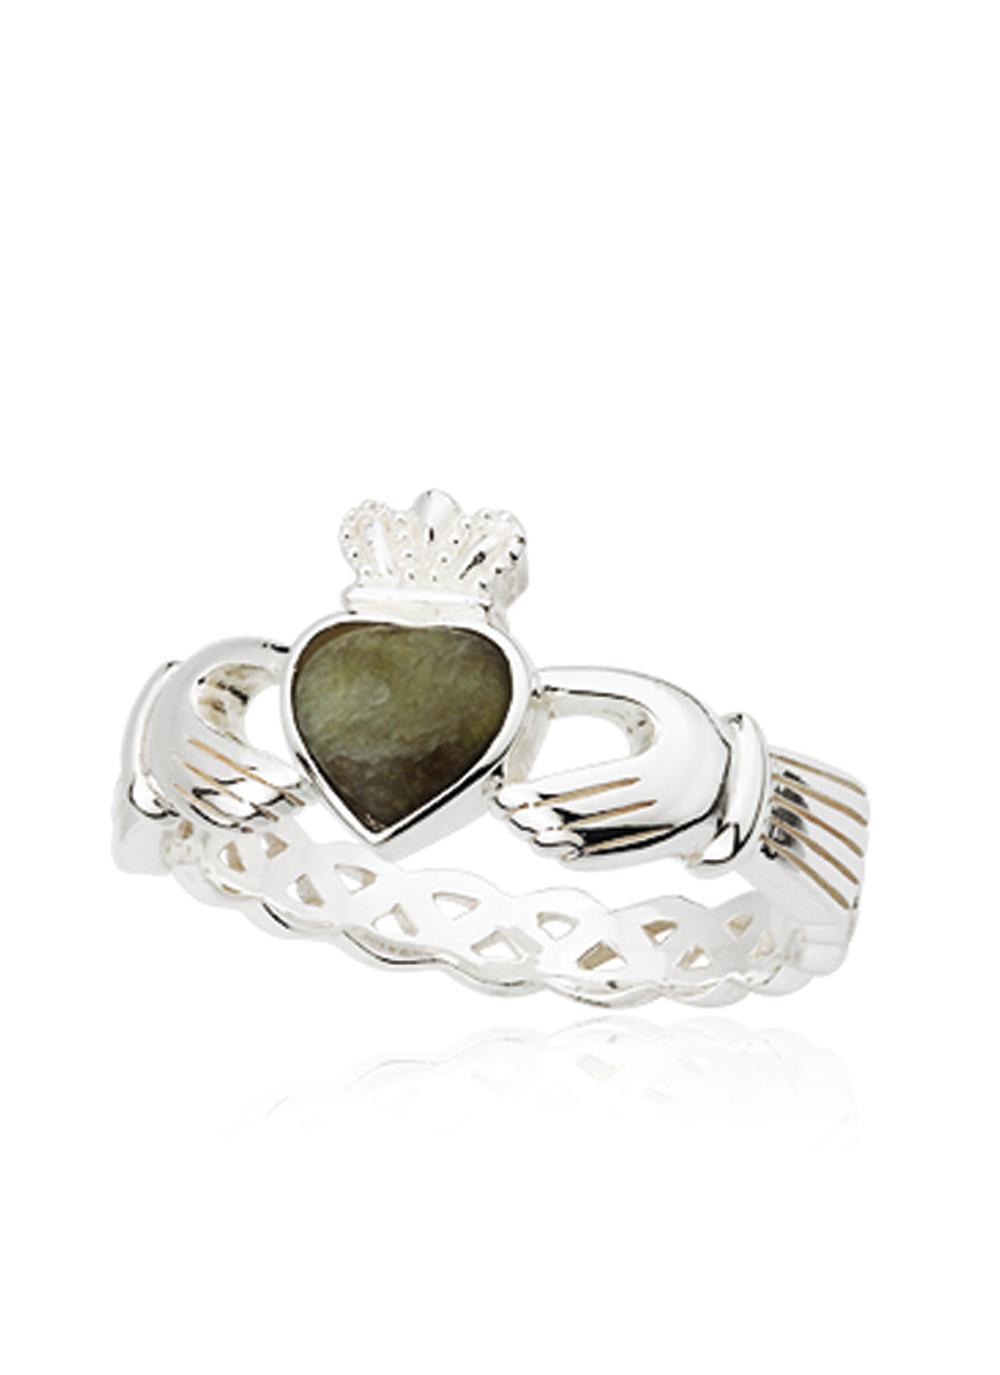 Connemara Marble Claddagh Weave Ring Blarney Com